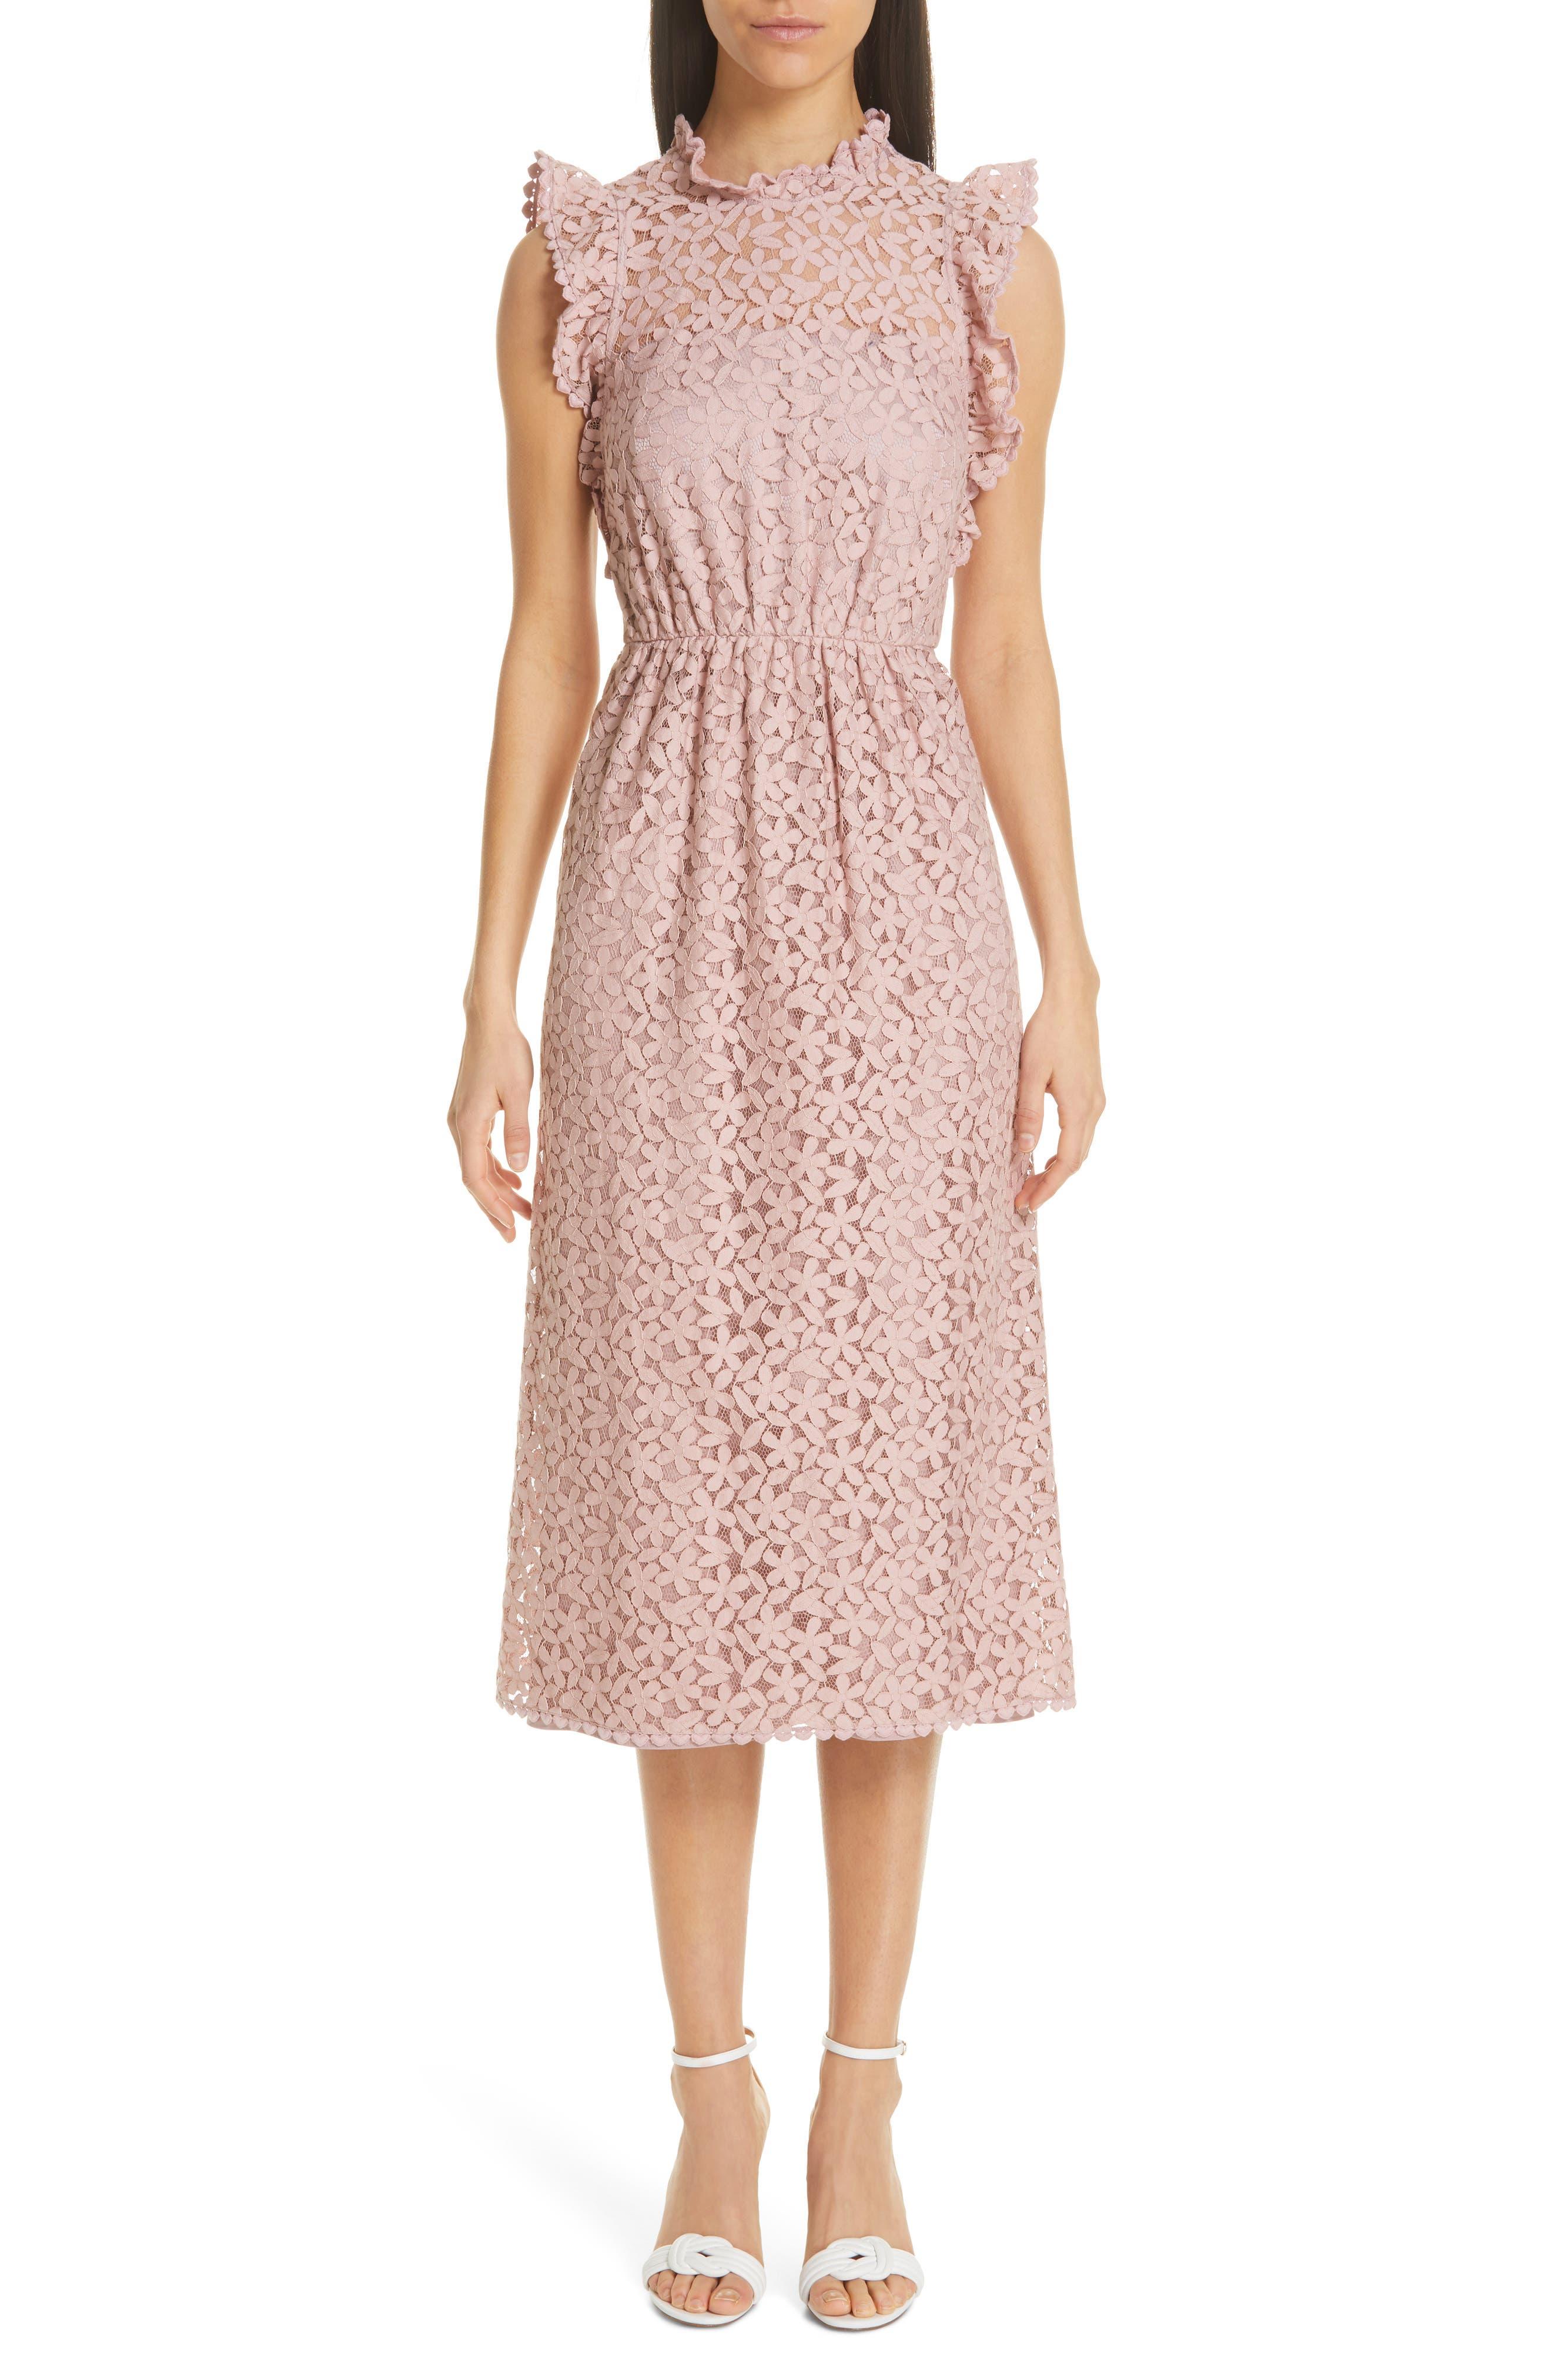 Kate Spade New York Flora Lace Ruffle Dress, Pink